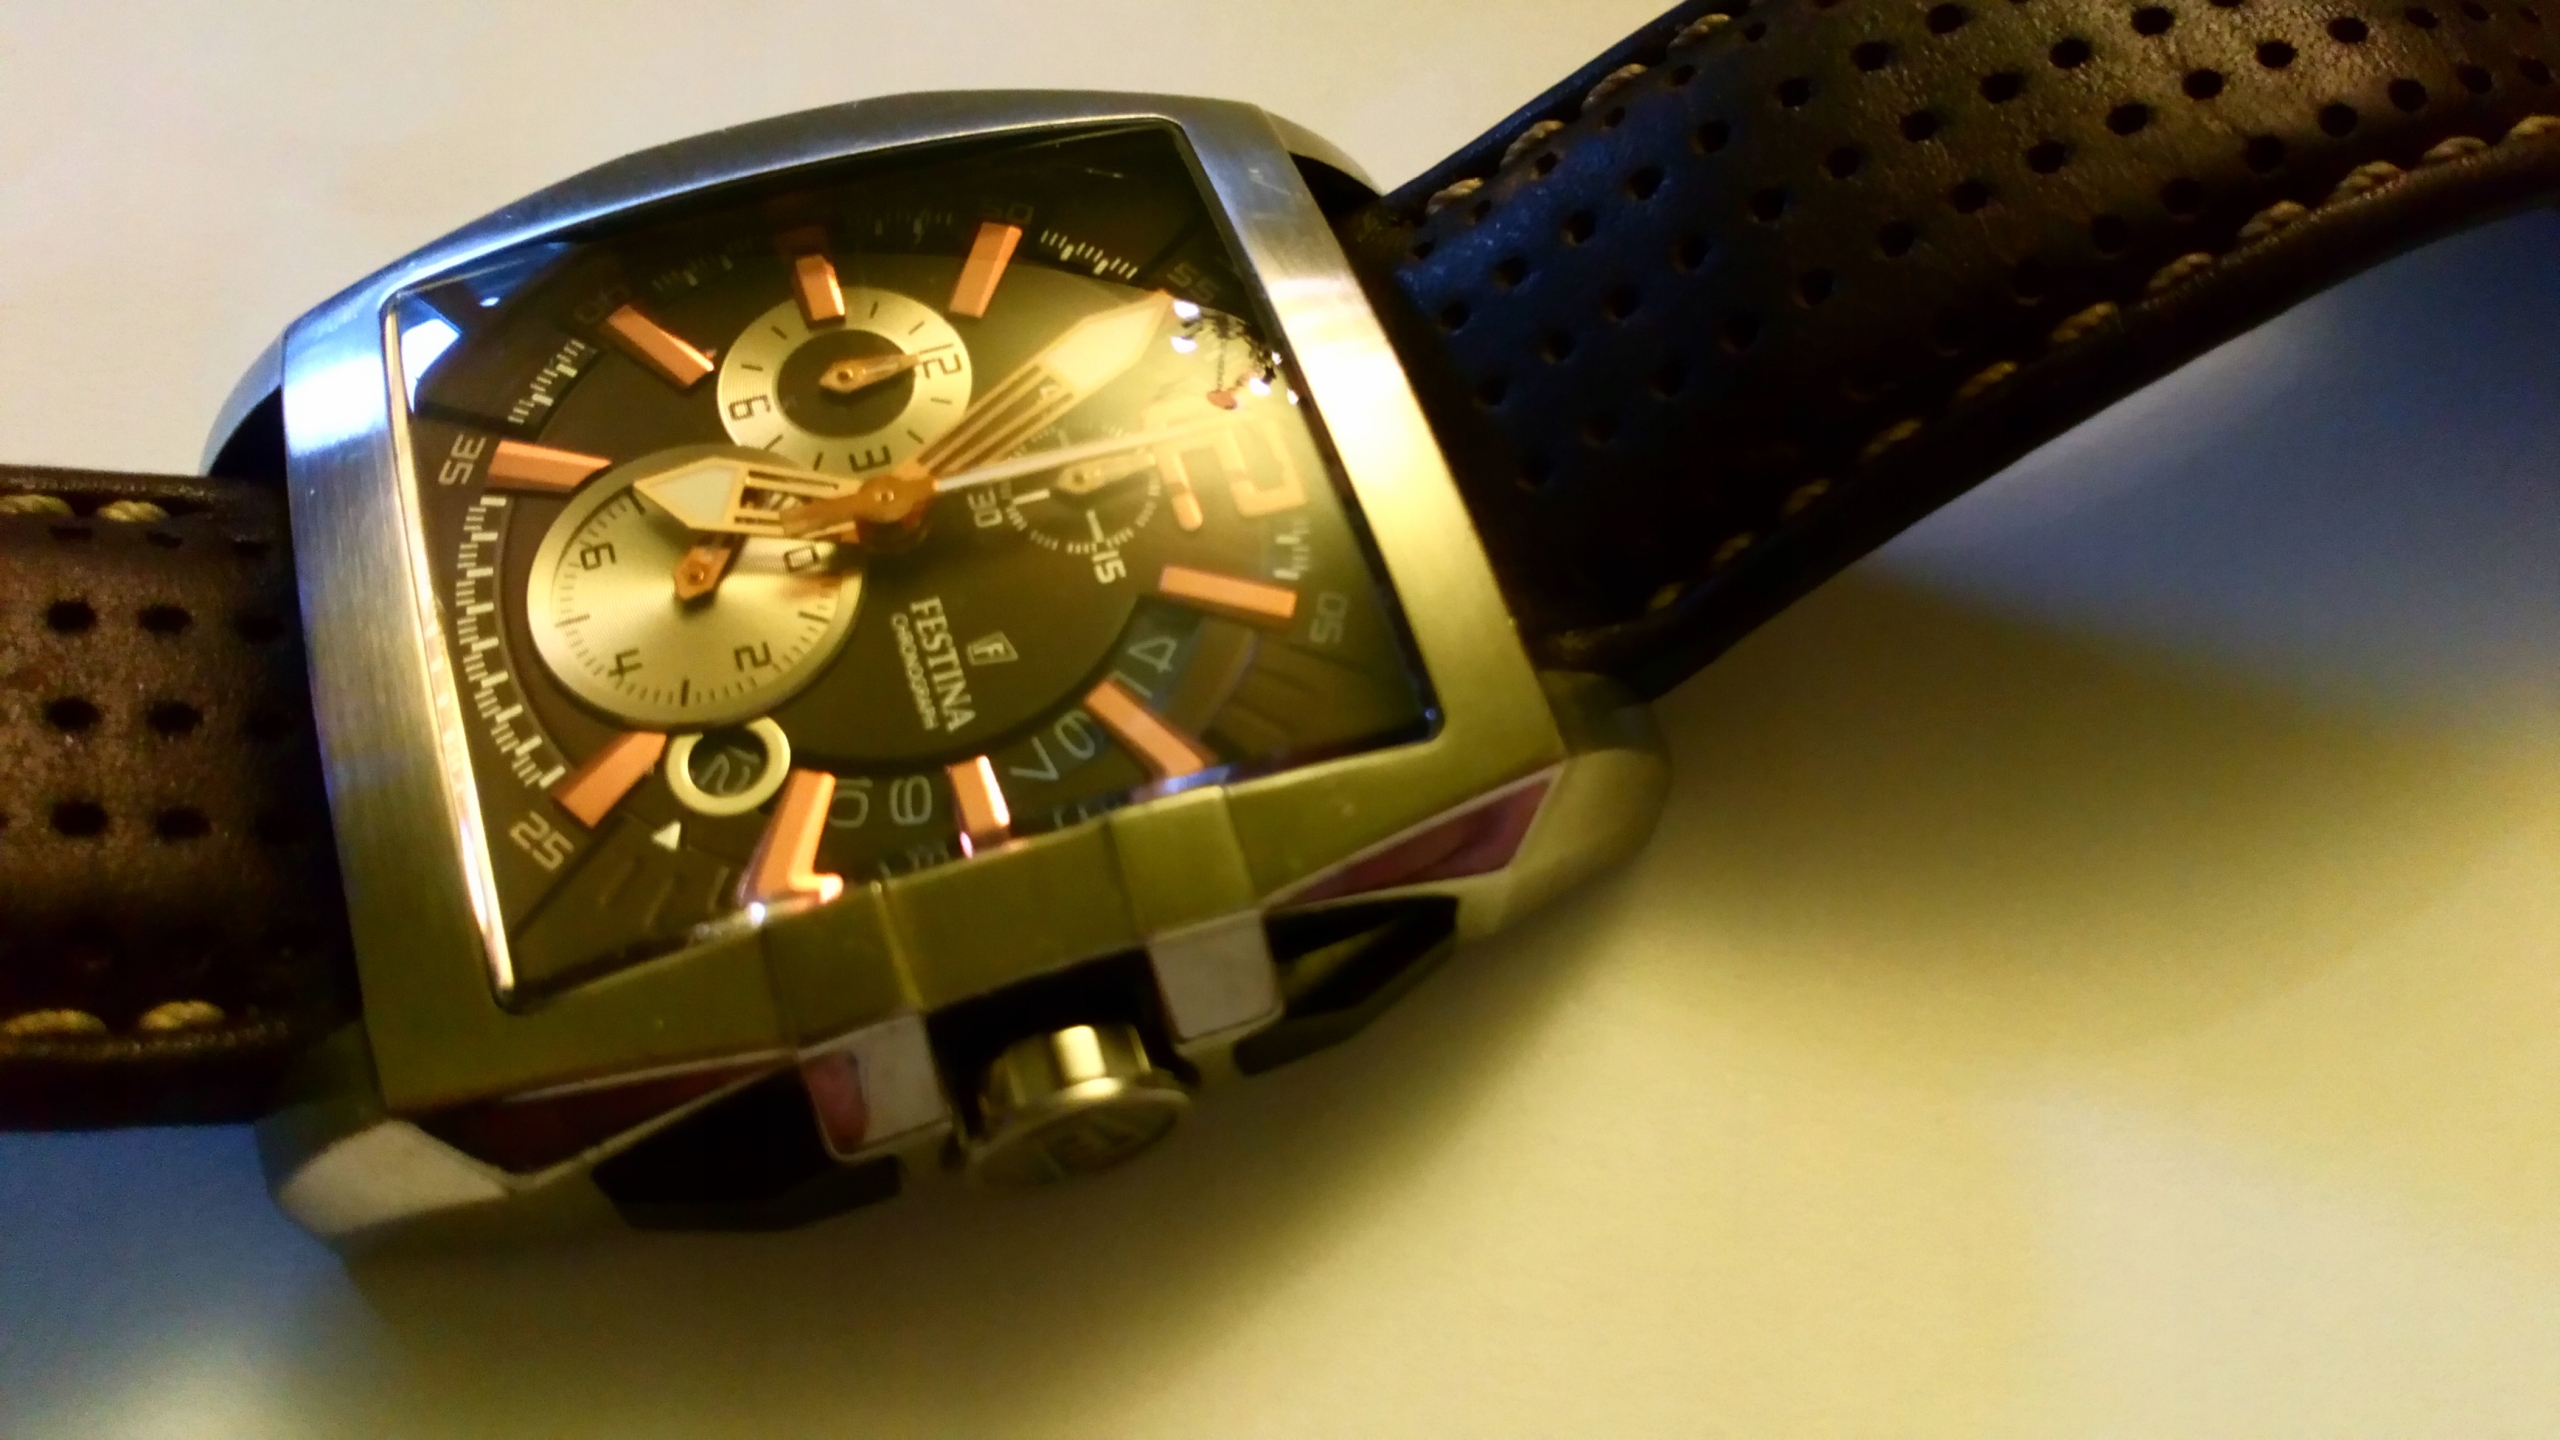 zegarek FESTINA CHRONOGRAPH jak nowy x2